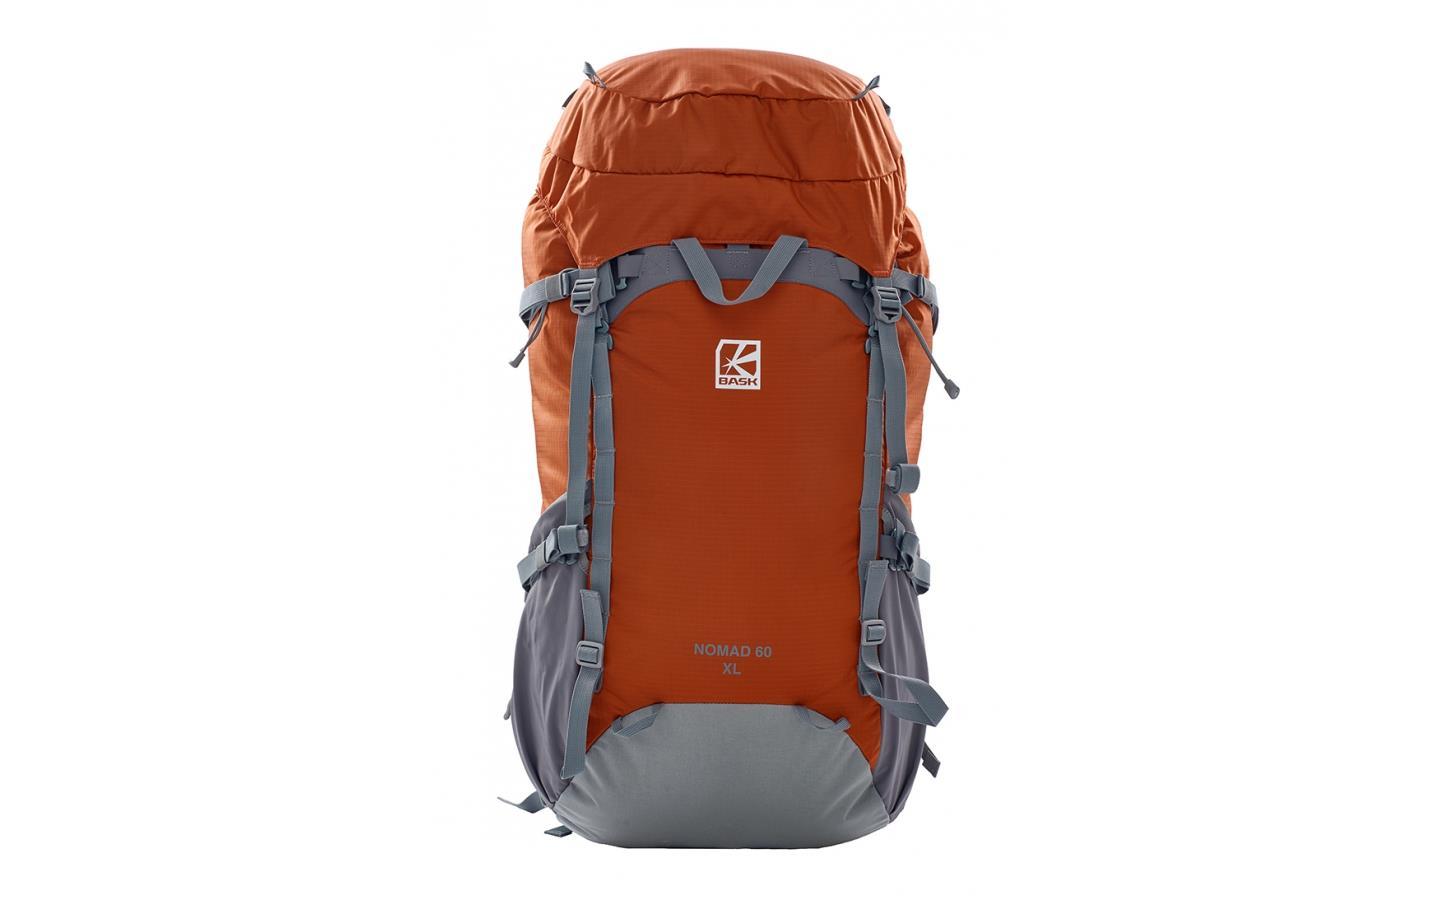 f49e93baccb3 Рюкзак BASK NOMAD 60 XL купить по цене в 9 900 р в интернет-магазине ...